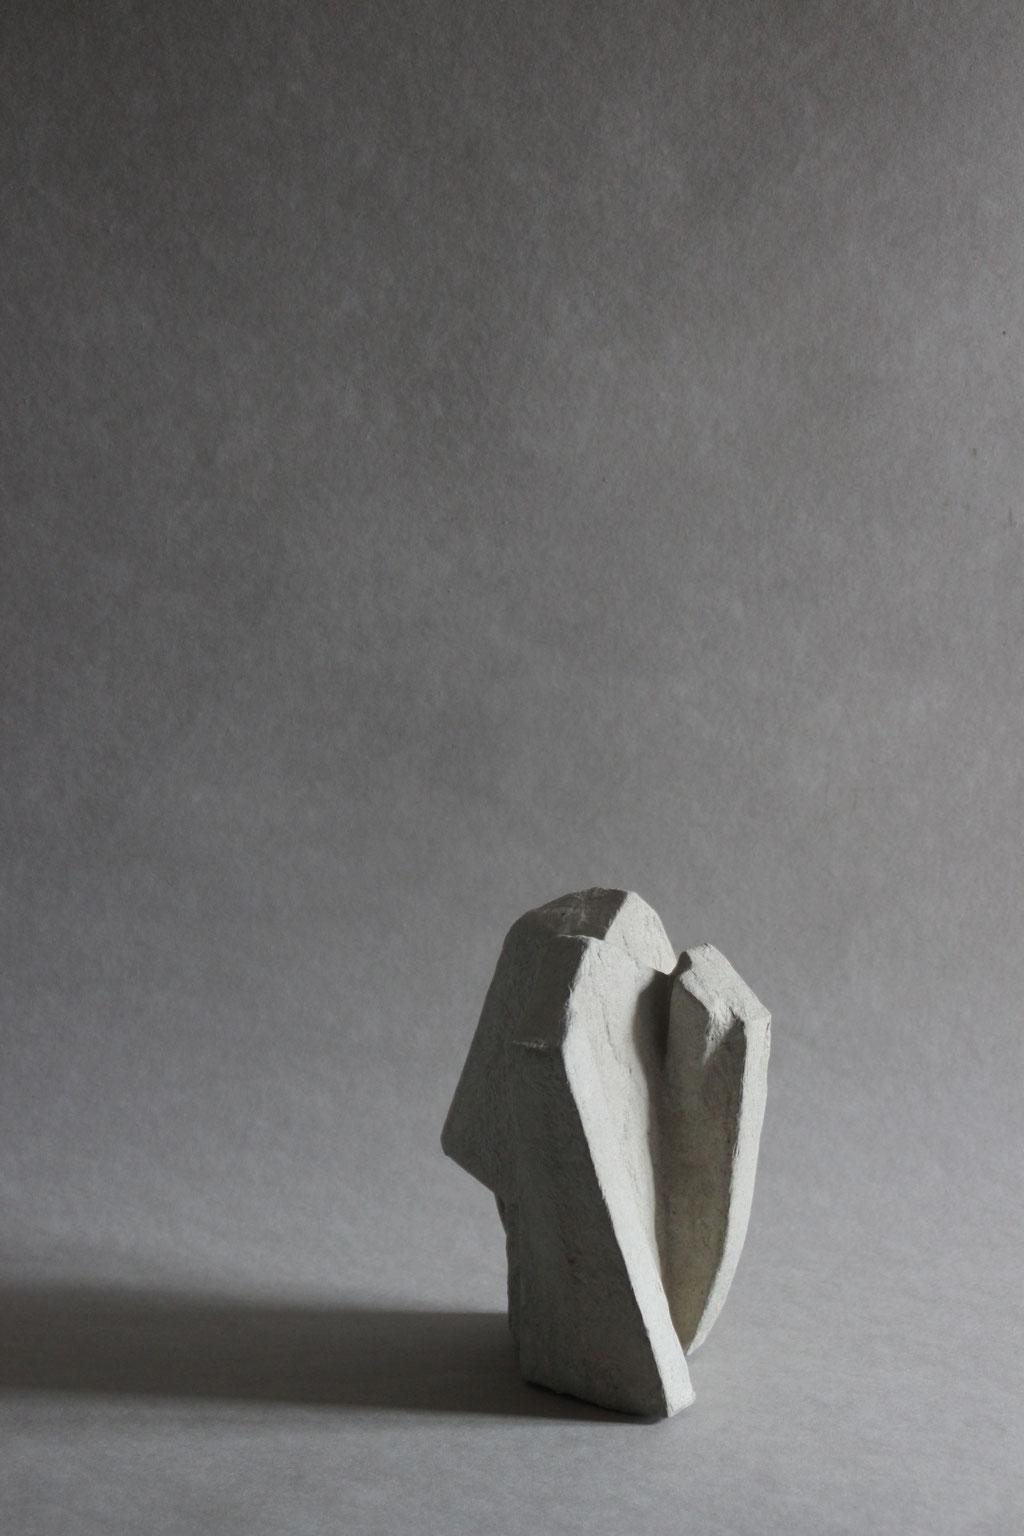 Particle small grey natural